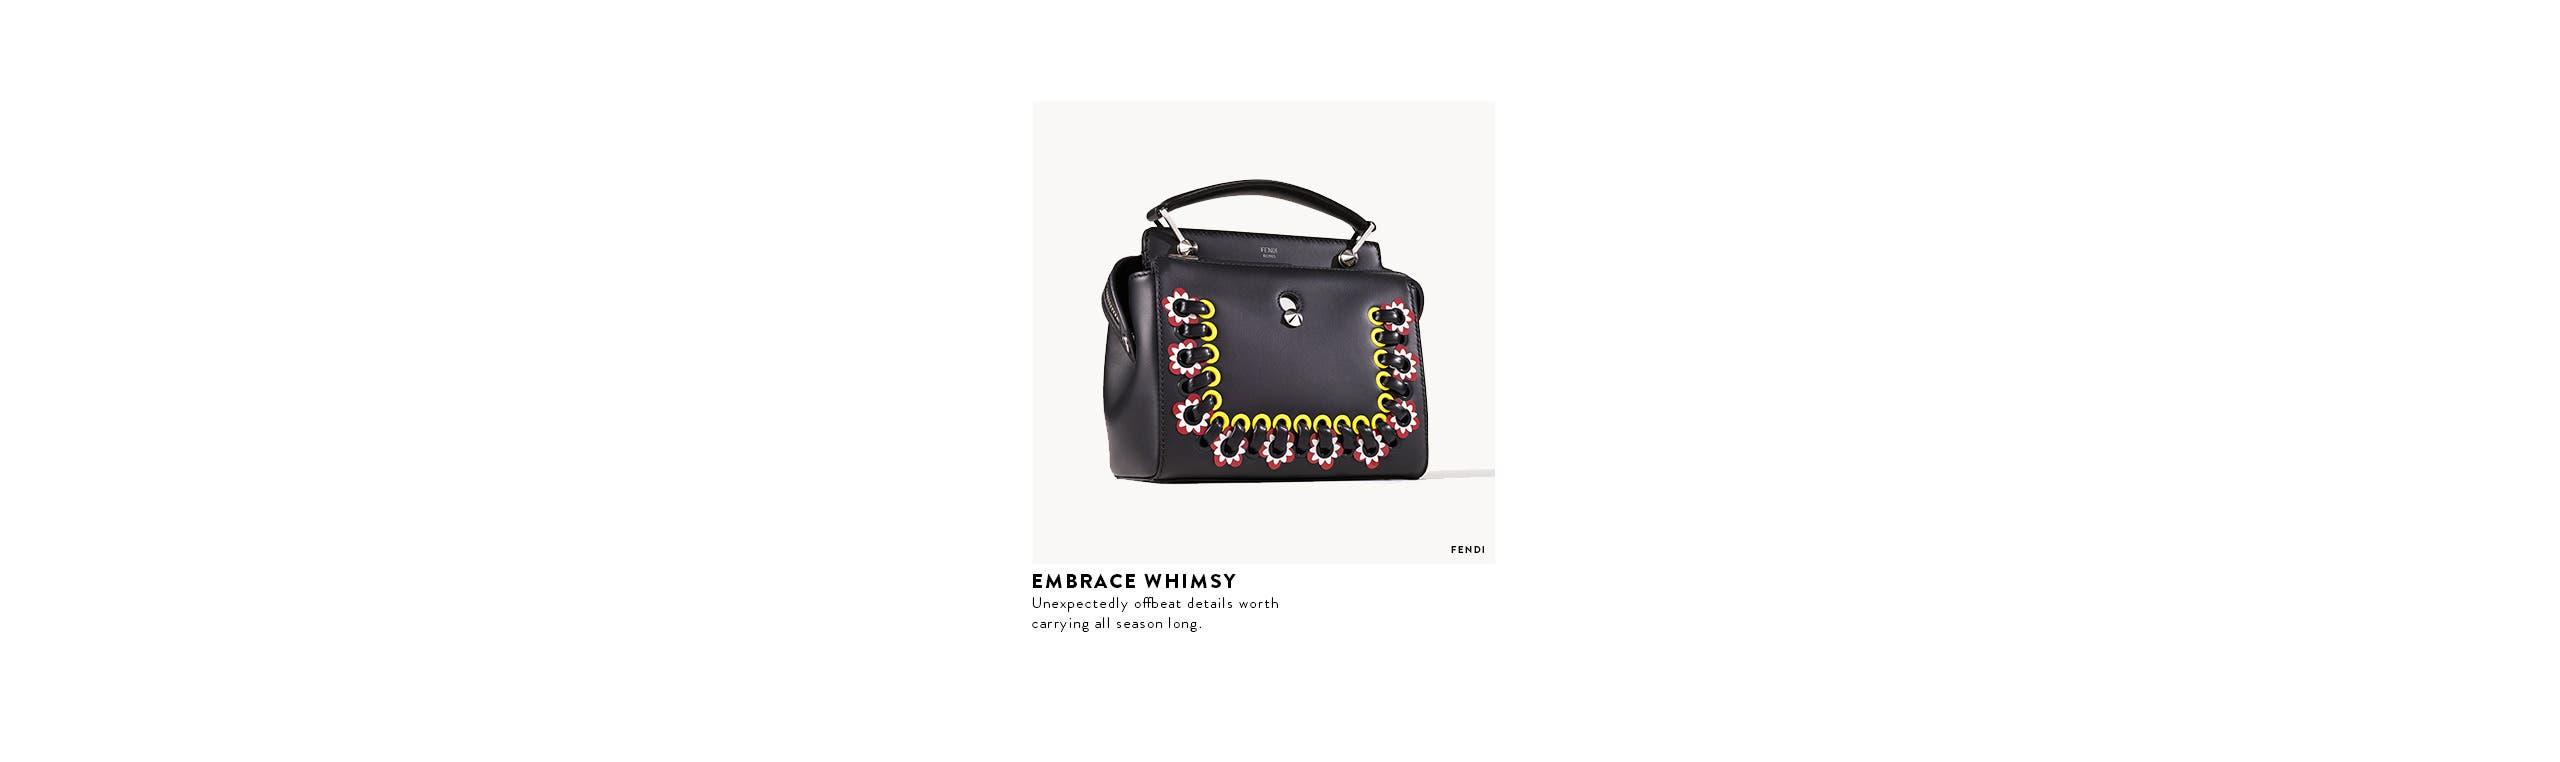 Designer new arrivals: Fendi floral handbag.